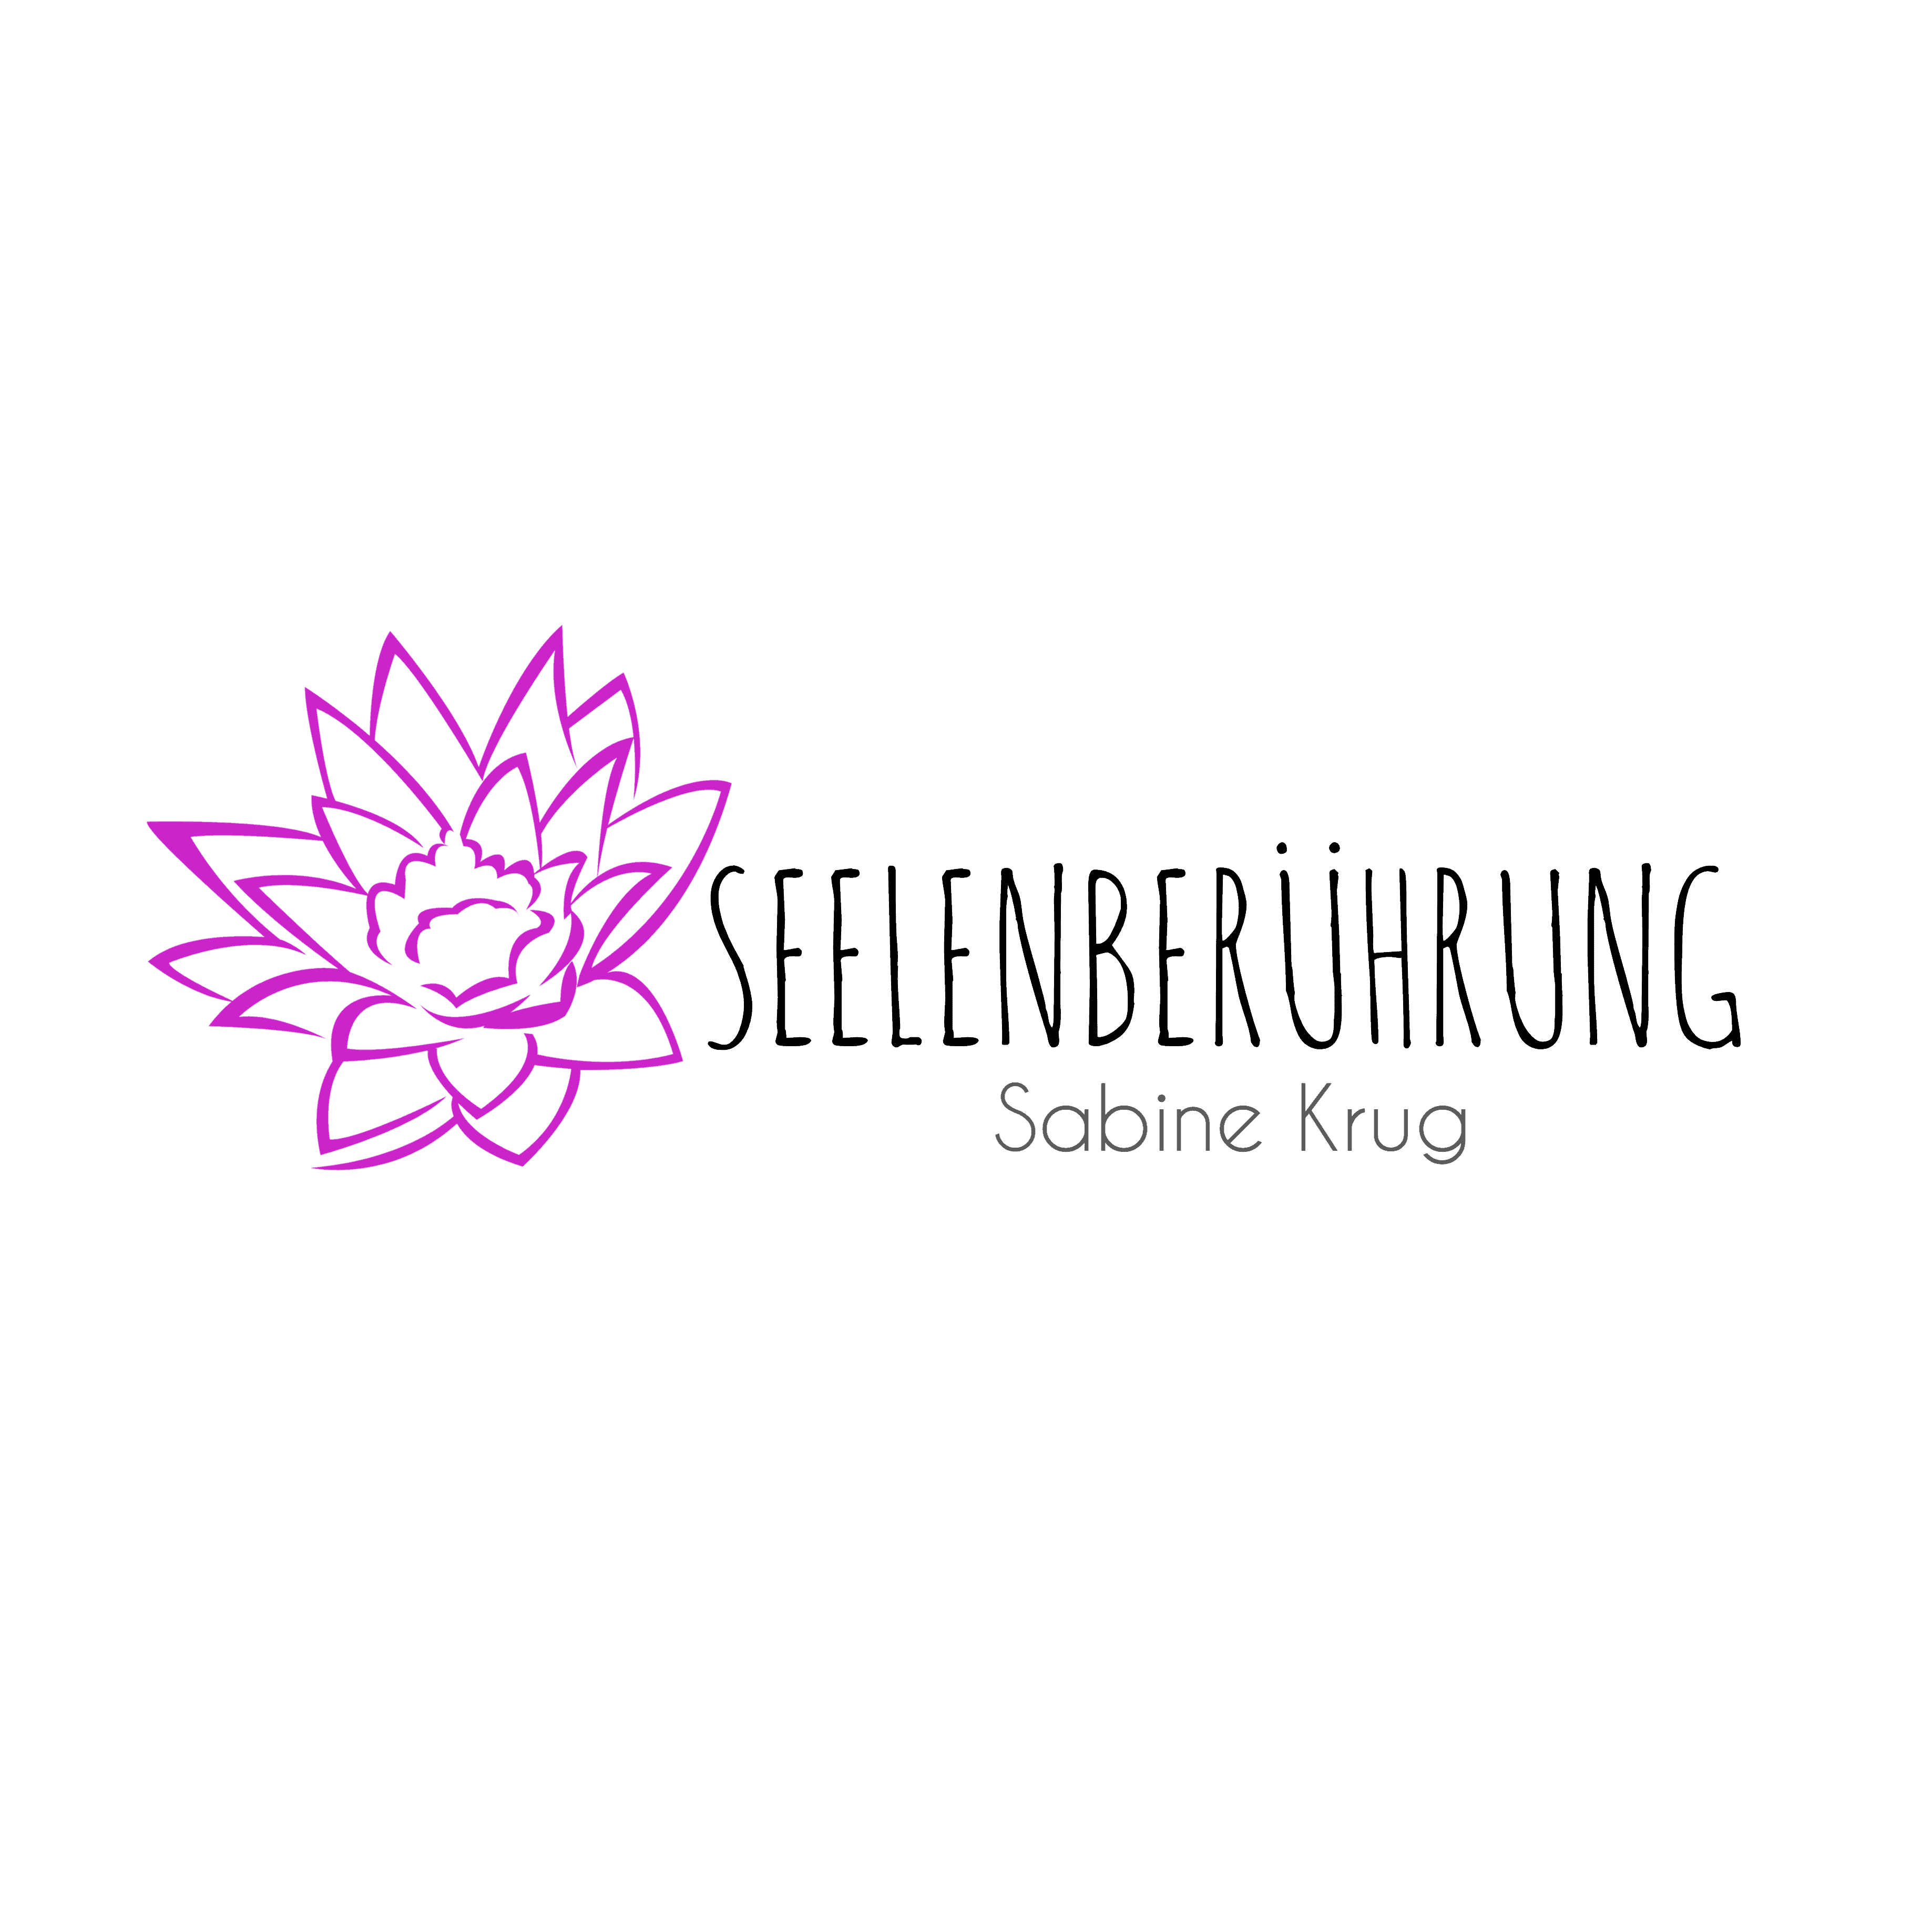 logo-seelenberuehrung-sabine-krug-kirchheim-jesingen-reiki-astrologie-kartenlegerin-handauflegen-transparent